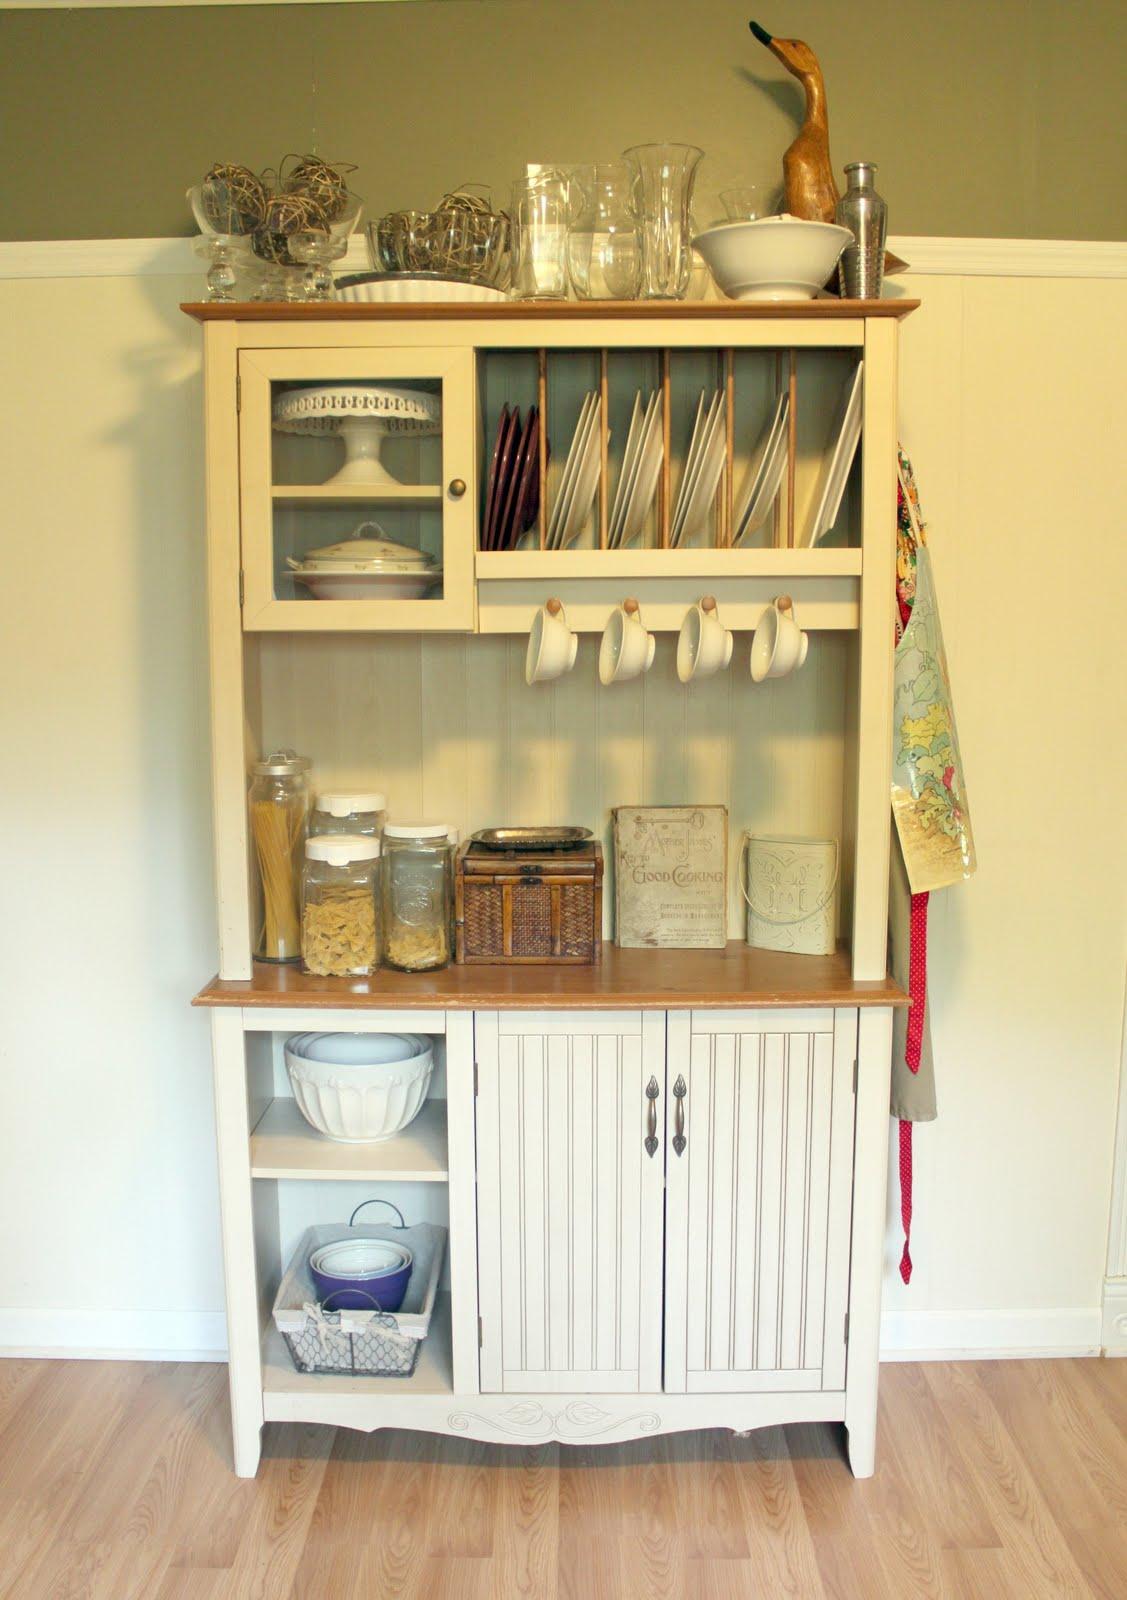 Nesting } - Organization Overload - The Cottage Mama